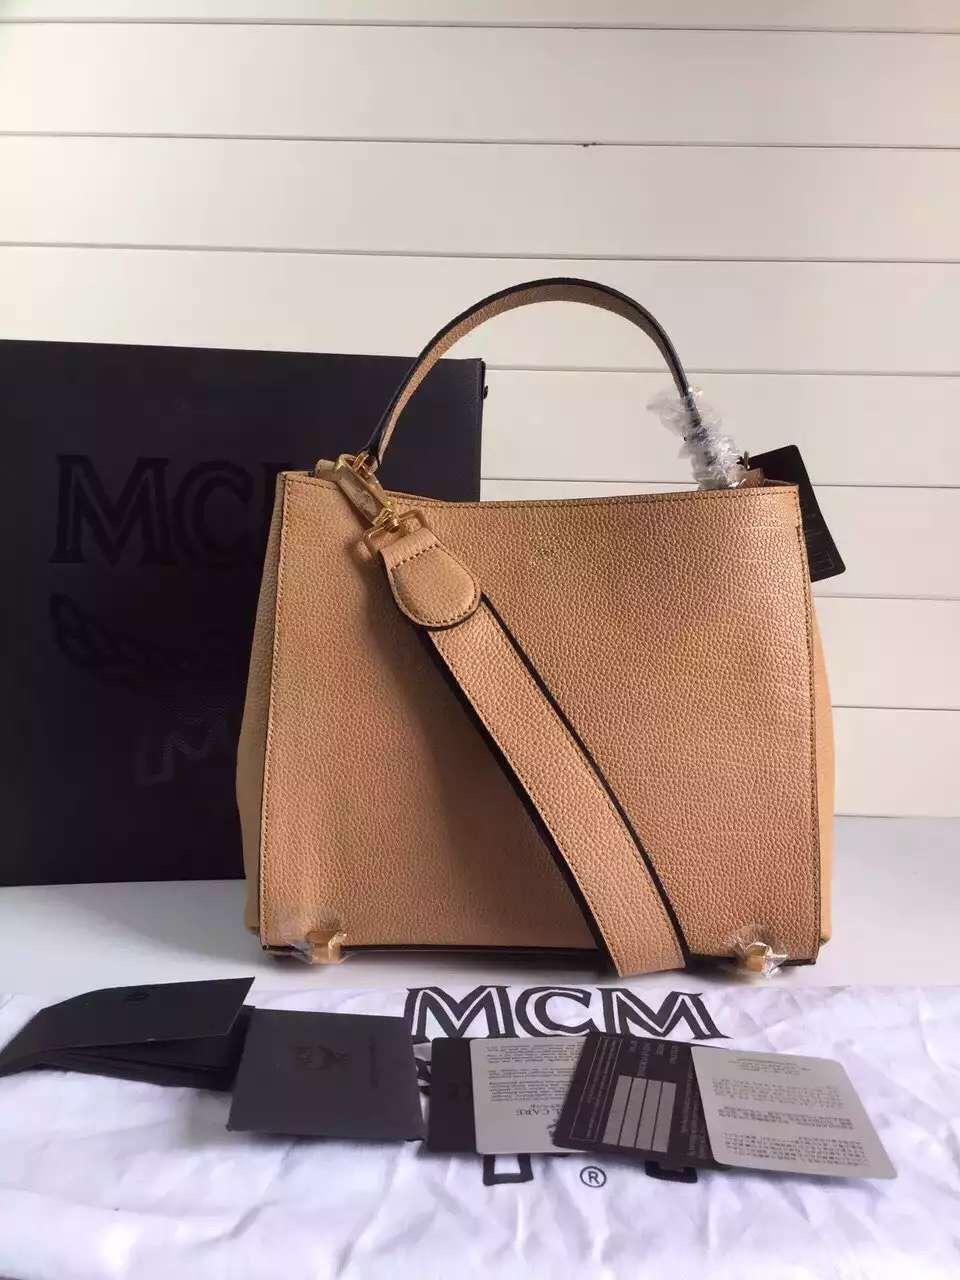 MCM旗舰店特供 进口粒面牛皮 细腻精致 纯棉里布 百搭包包